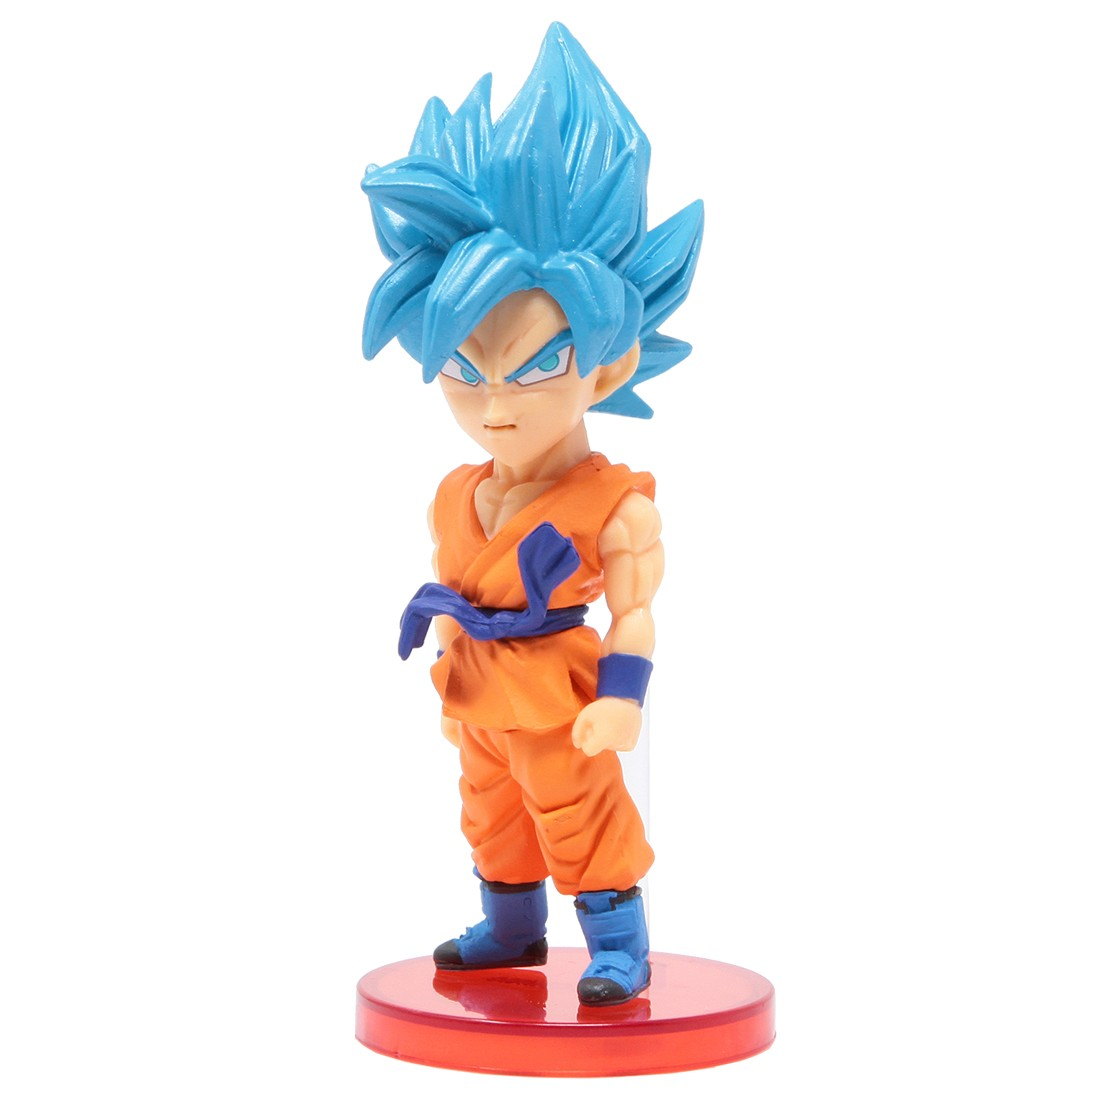 Banpresto Dragon Ball Legends Collab World Collectable Figure Vol 3 - 15 Super Saiyan Blue Son Goku (blue)